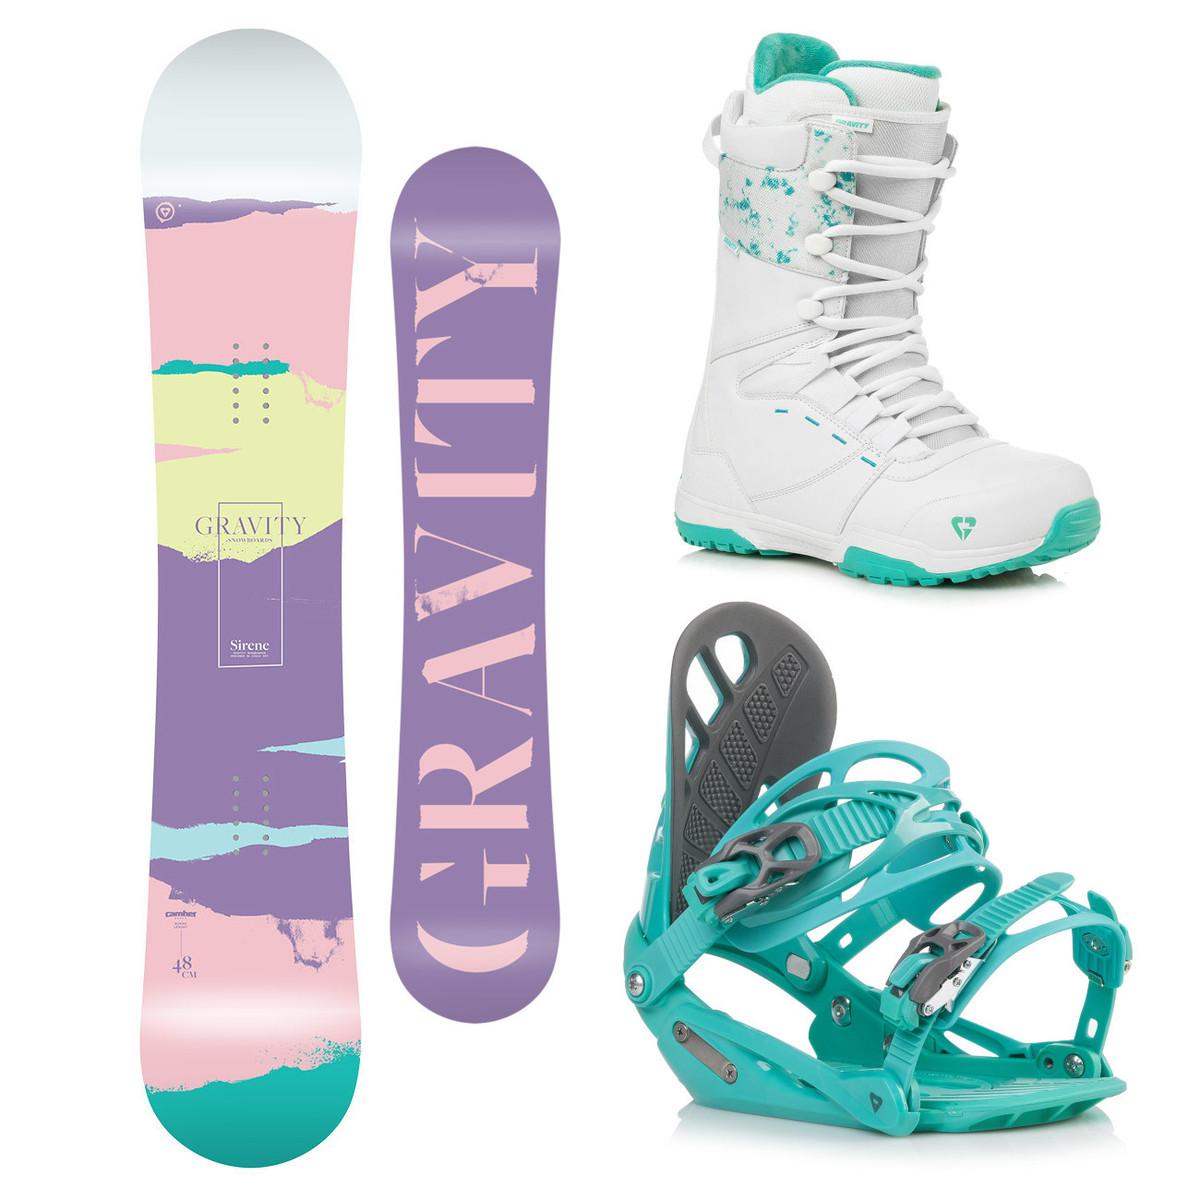 Snowboardový komplet Gravity Sirene 18/19 M (EU 37-42) 144 Zelená